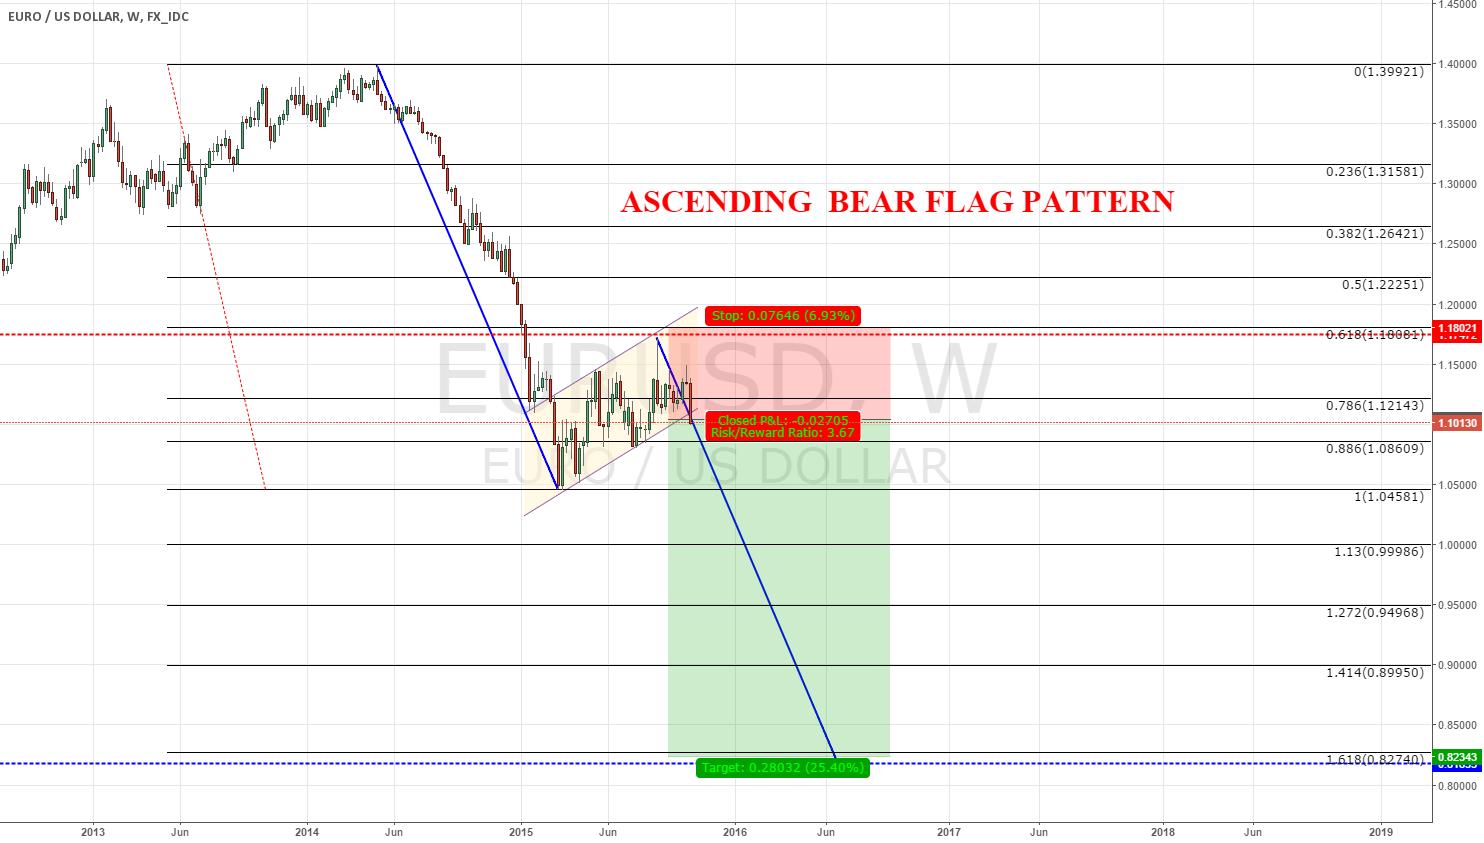 eurusd,weekly, ascending bear flag